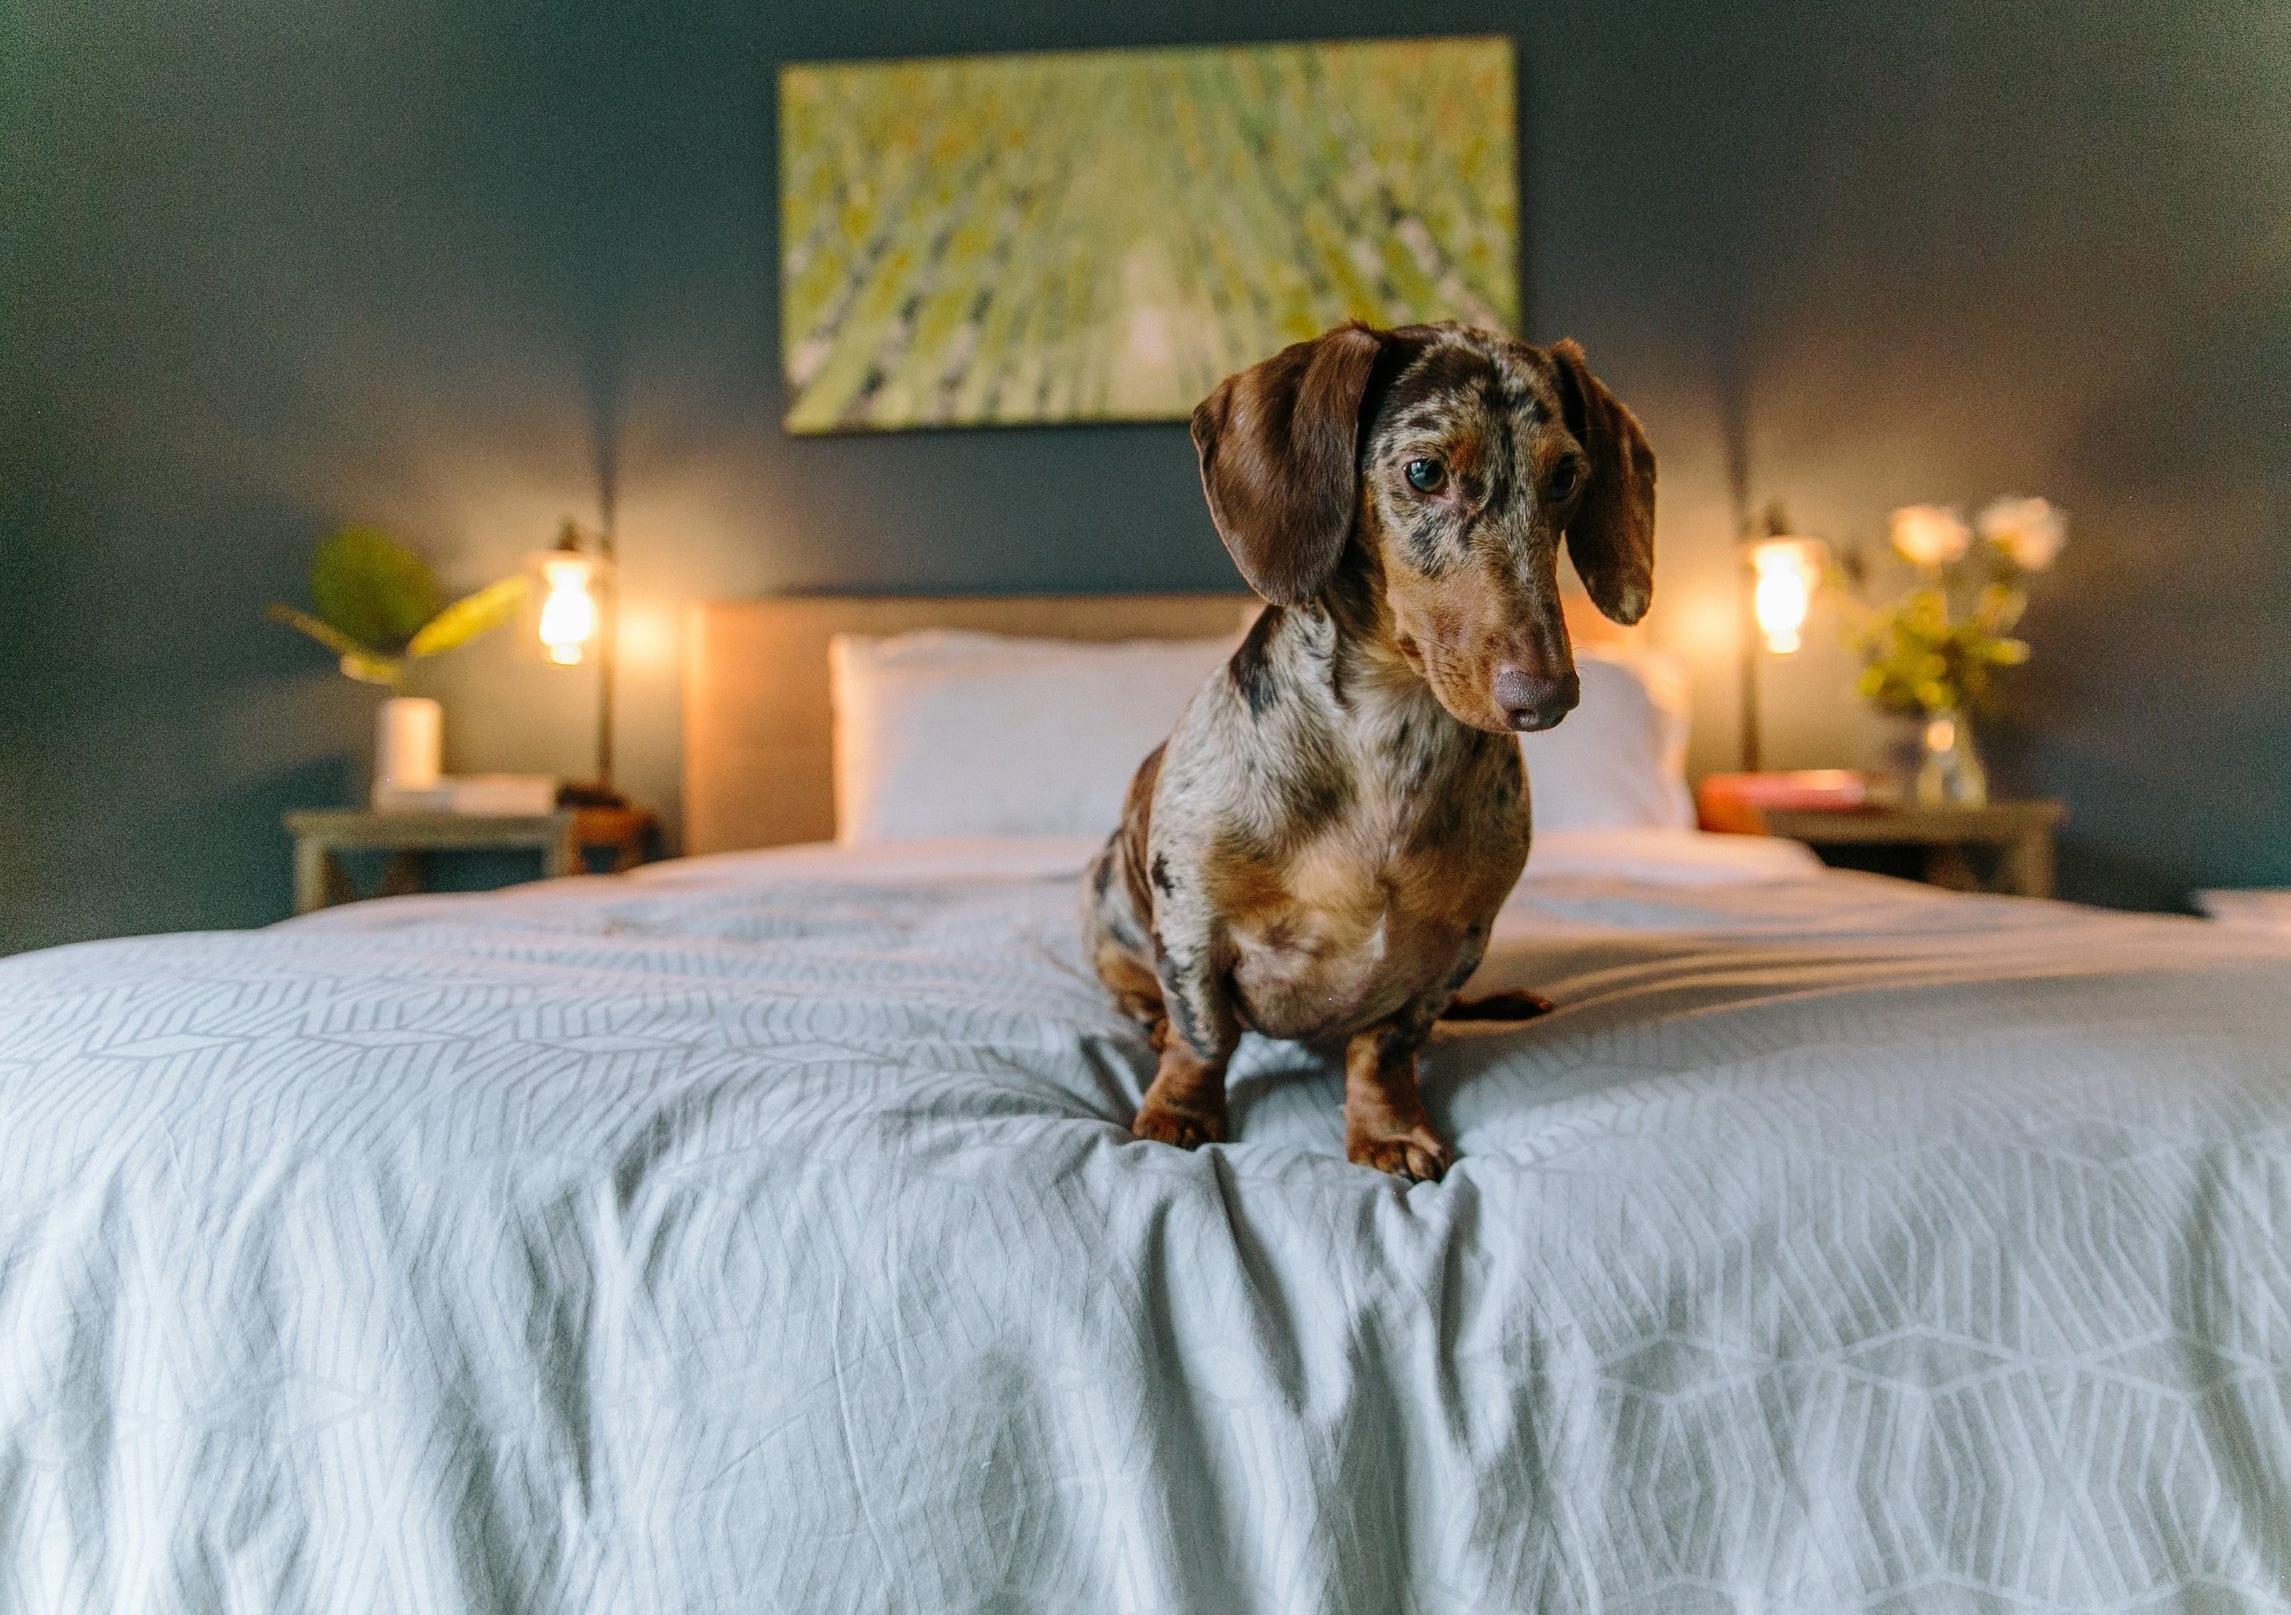 Dog in bedroom dapple